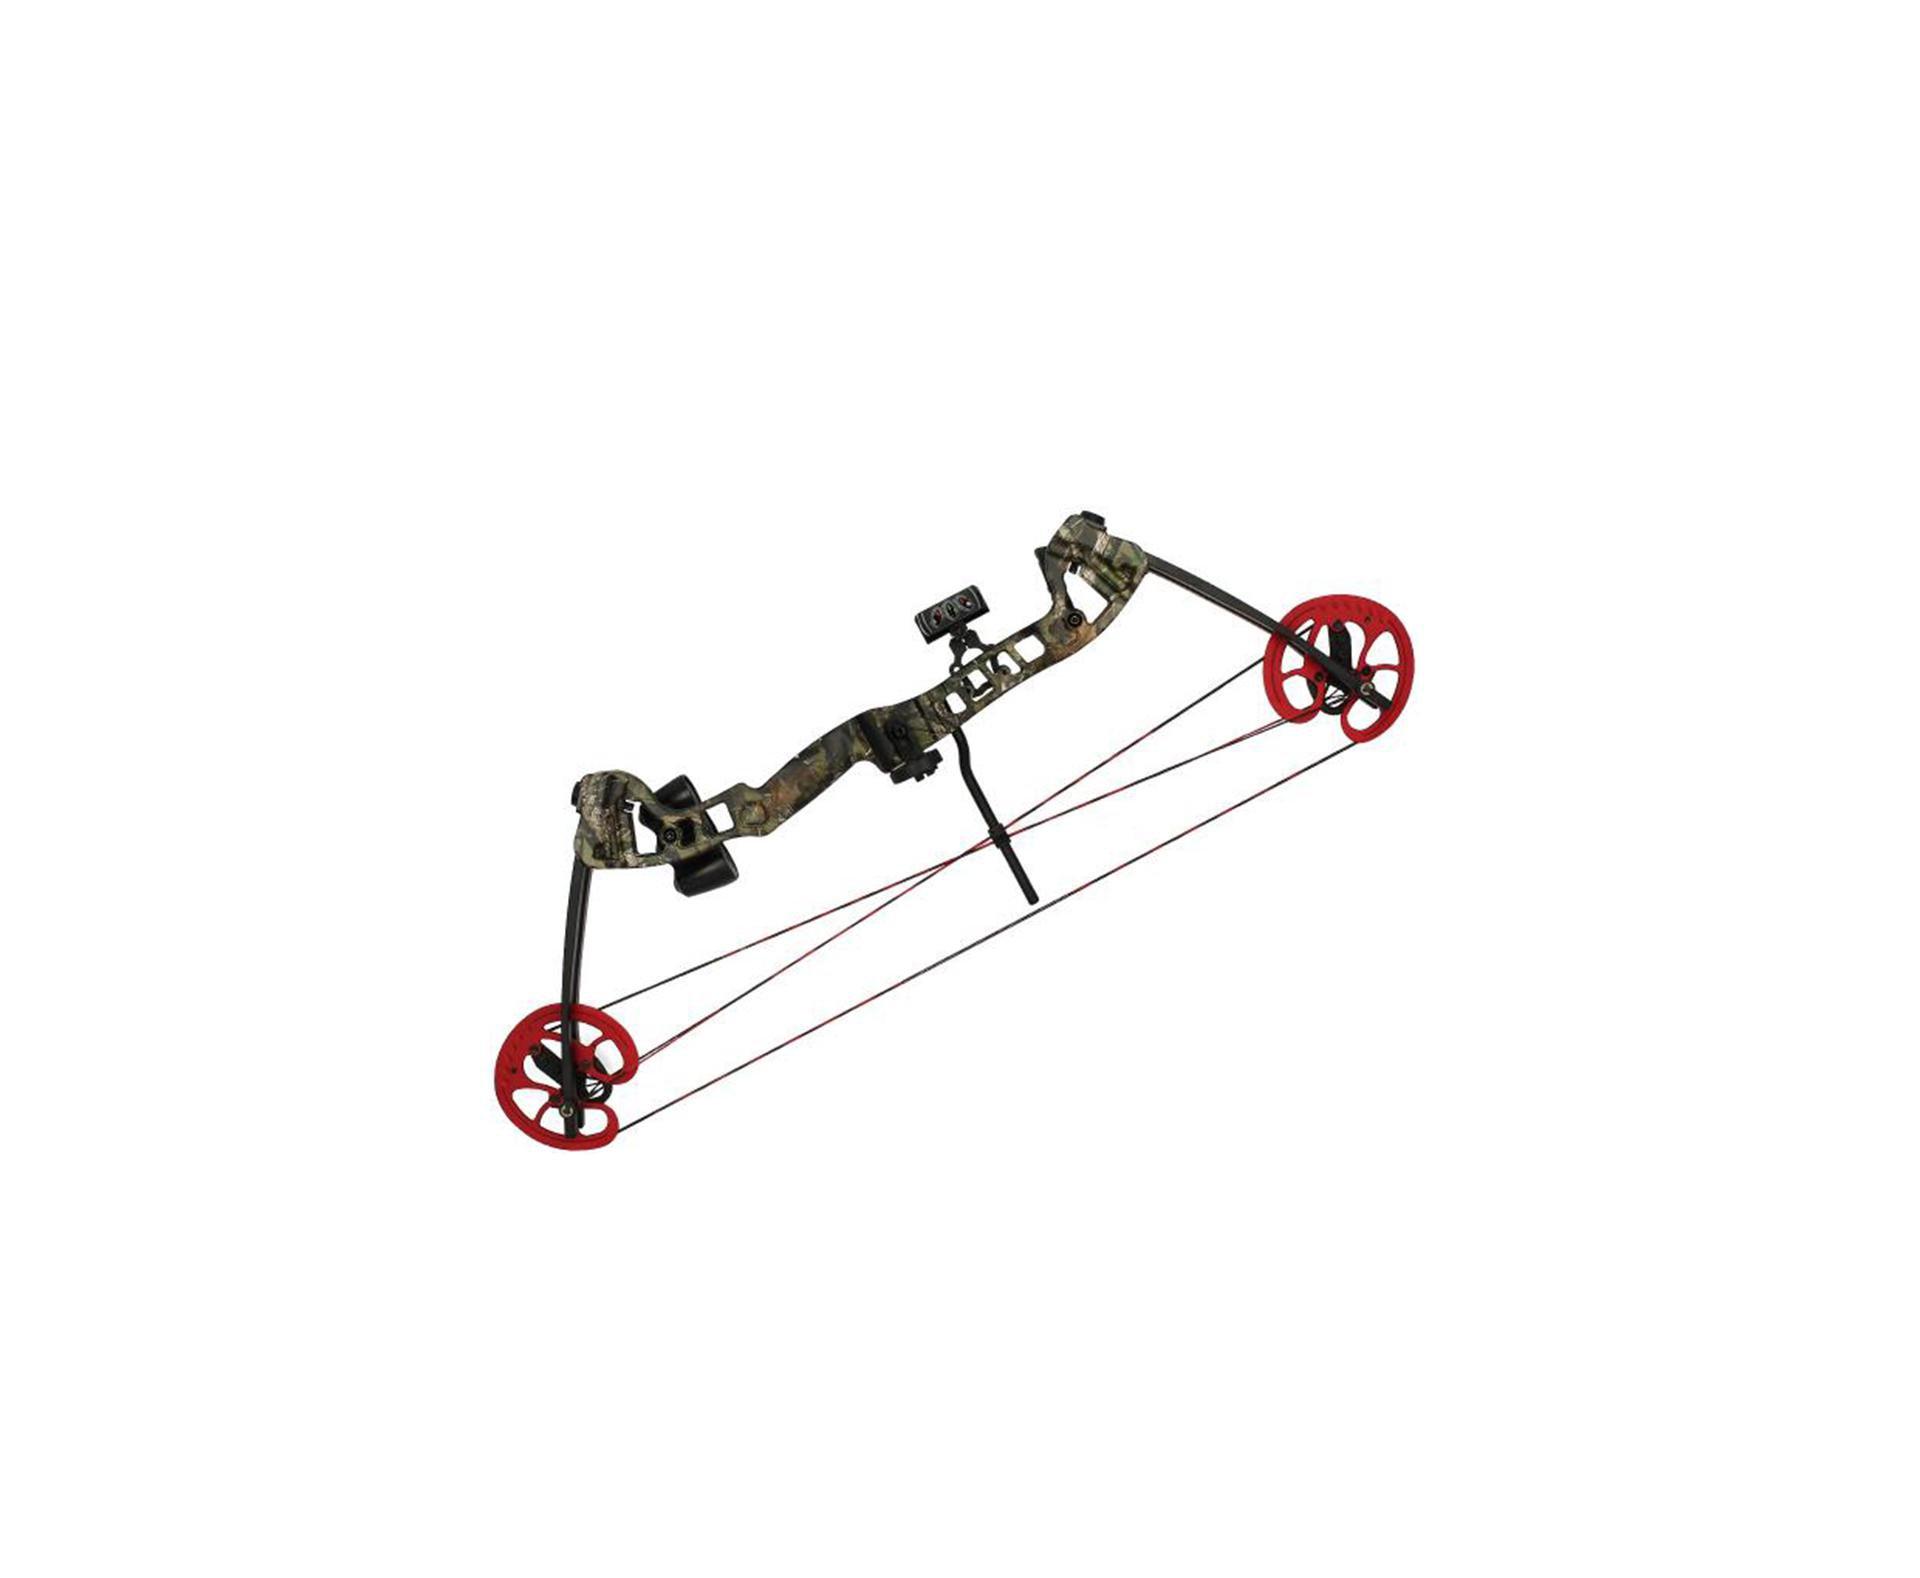 Arco Composto Vortex Hunter 45 - 60 Lbs Destro - Camuflado - Barnett